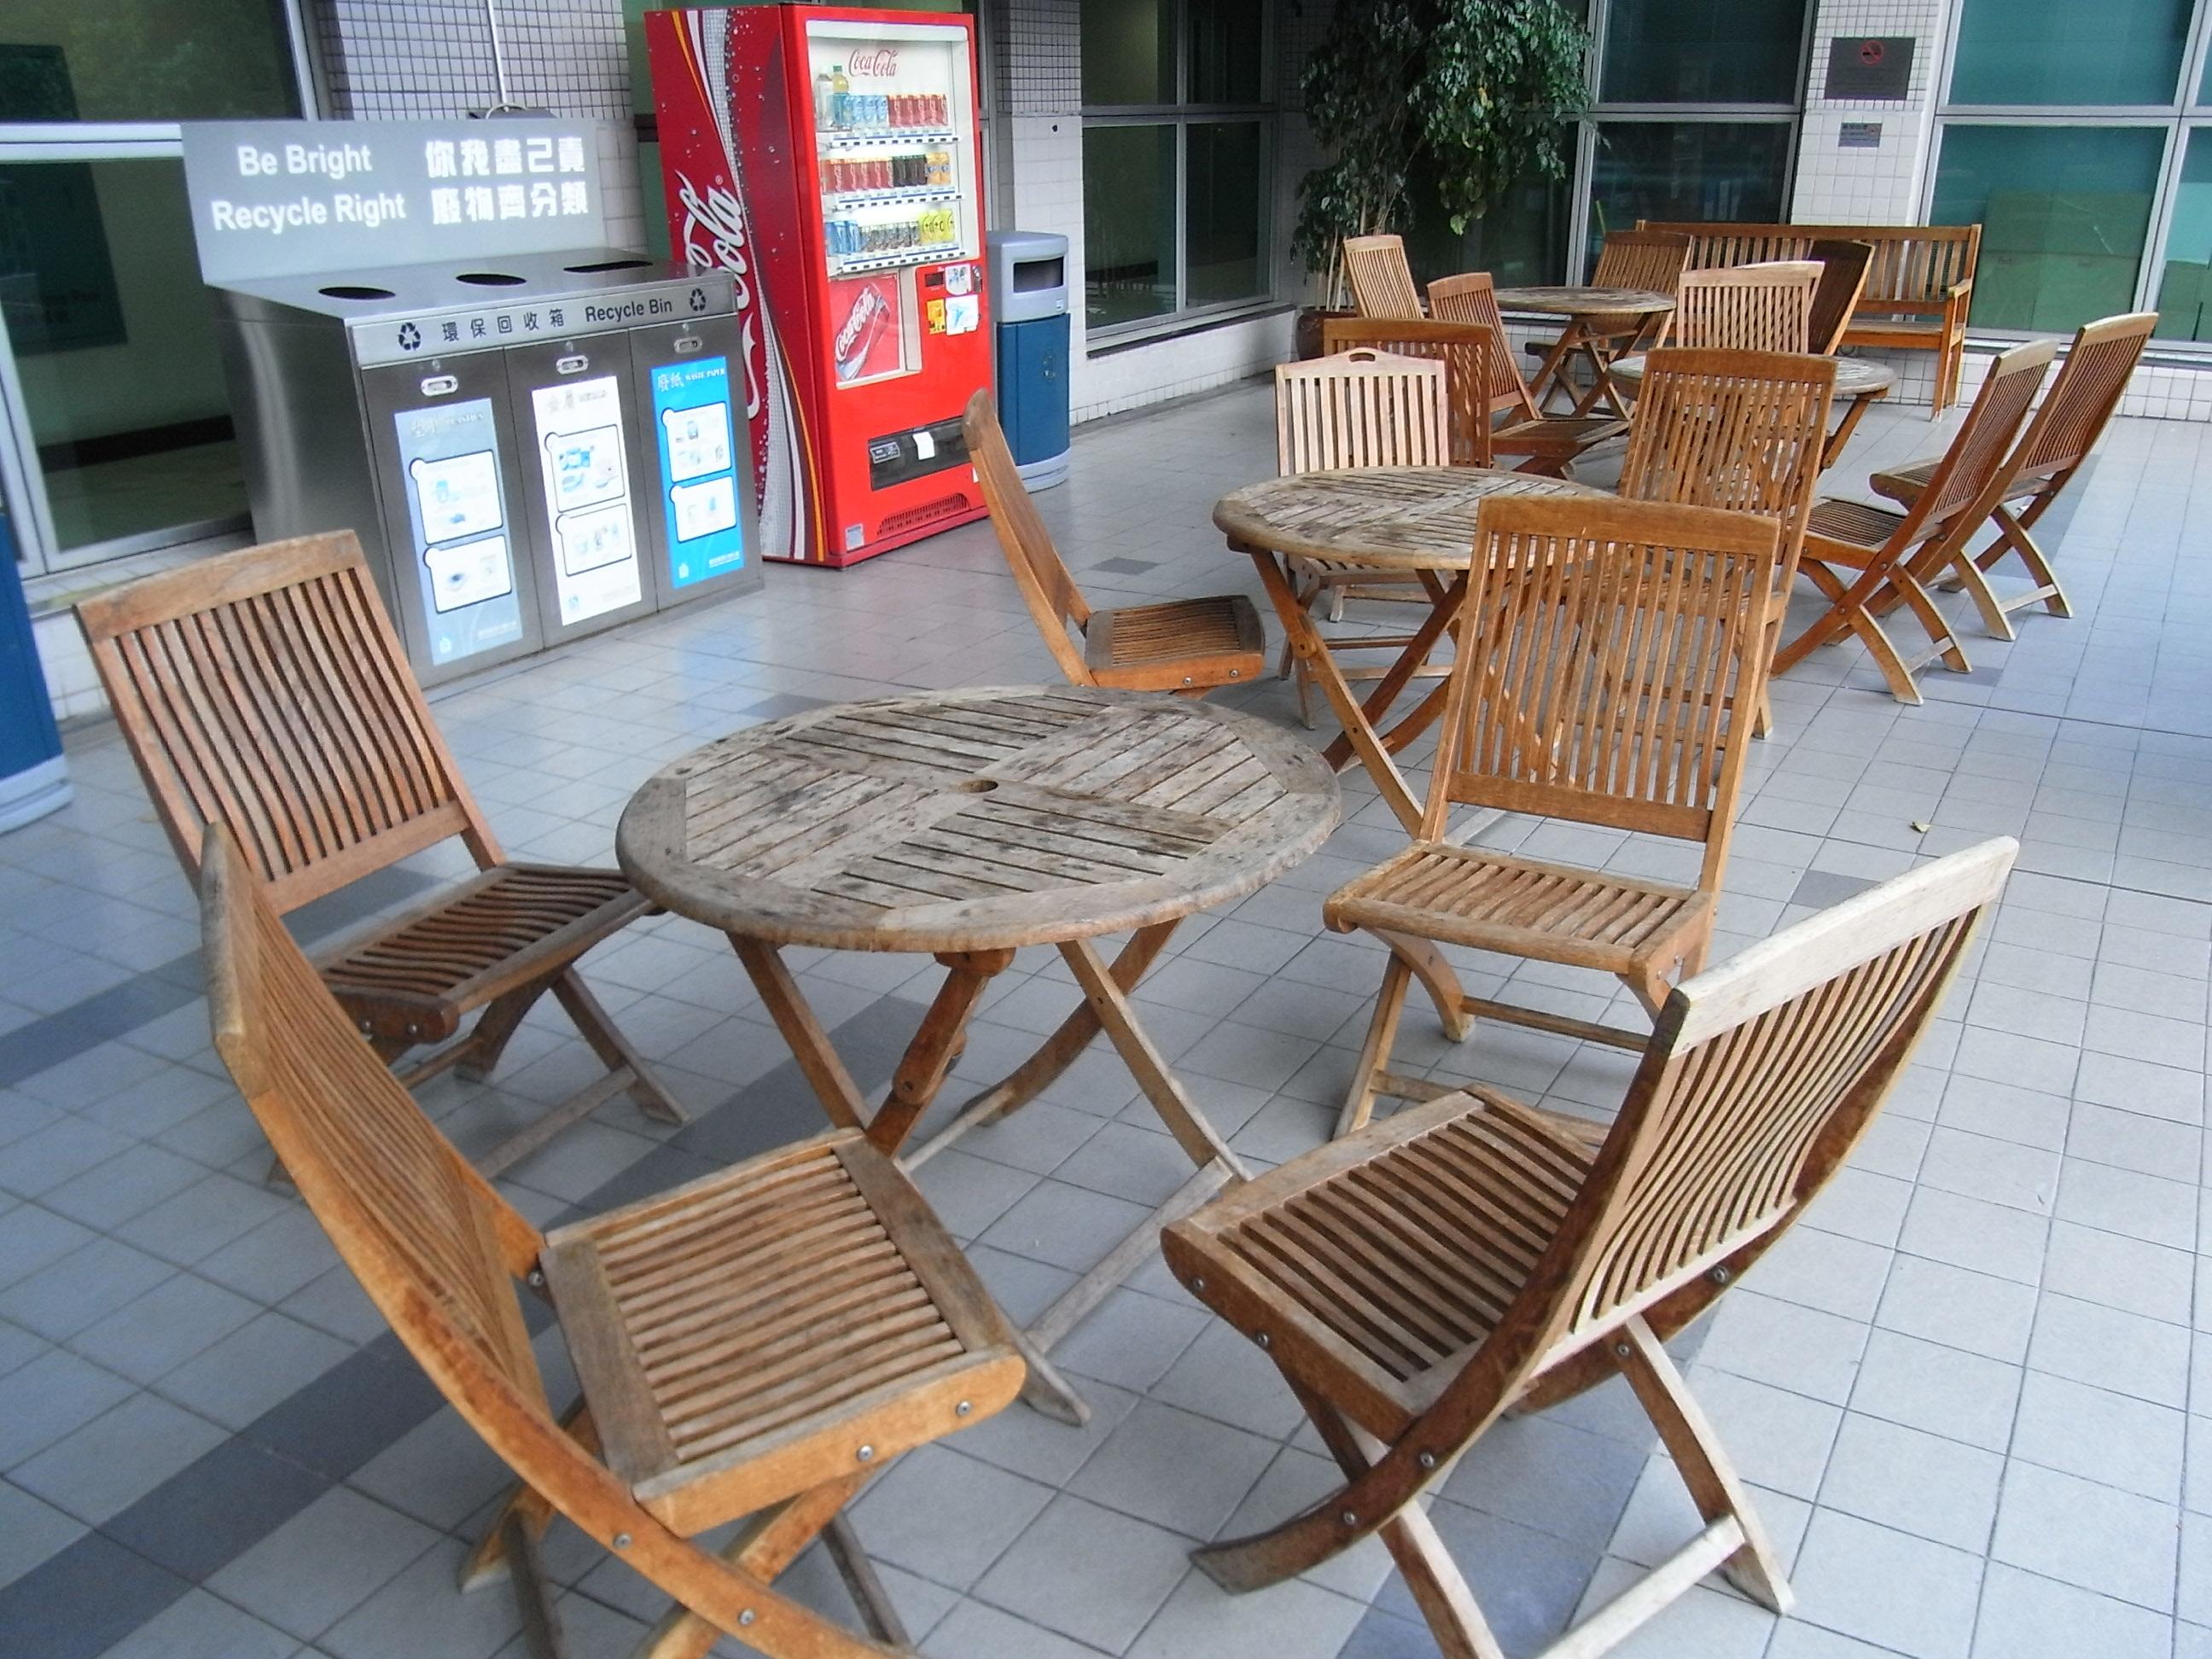 Wooden garden furniture with lazy susan